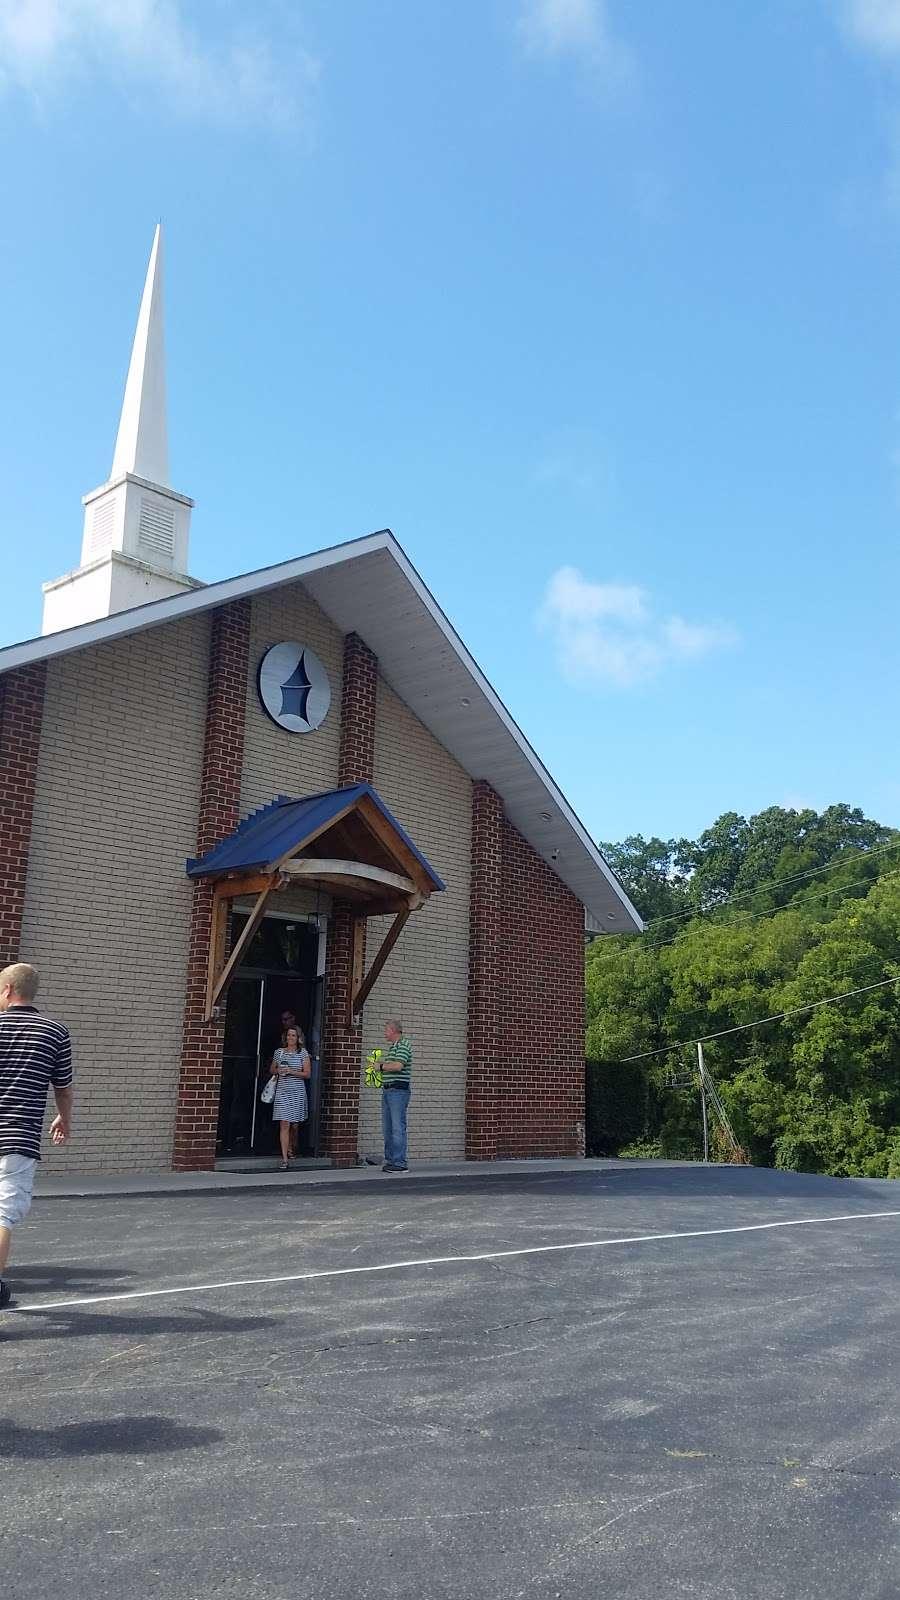 Hope Community Church - church  | Photo 2 of 9 | Address: 6867 Hedgesville Rd, Hedgesville, WV 25427, USA | Phone: (304) 754-8020